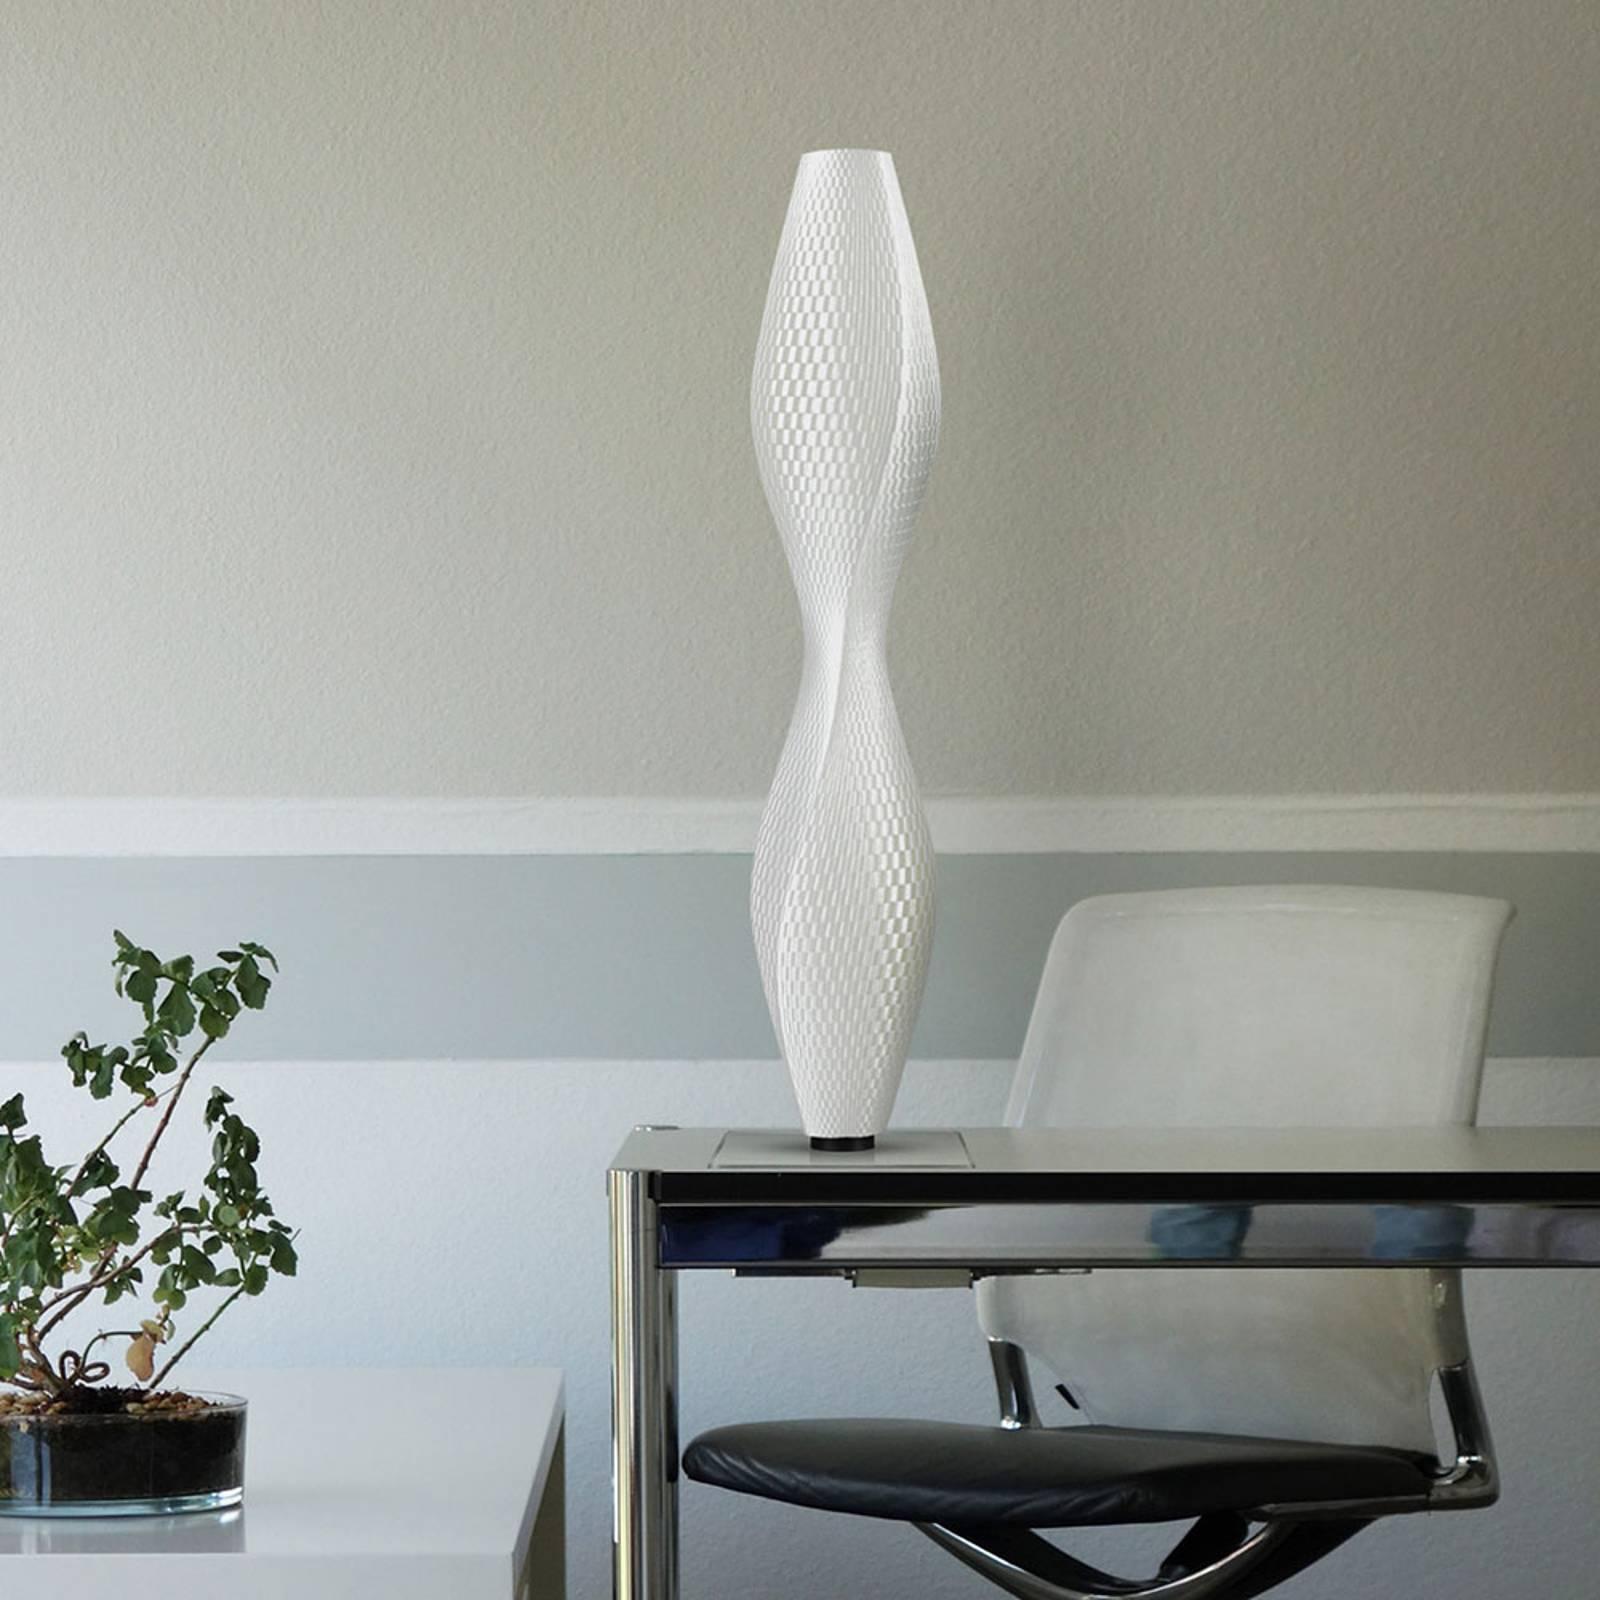 Lampa stojąca LED plecionka Lava, 75cm, biała